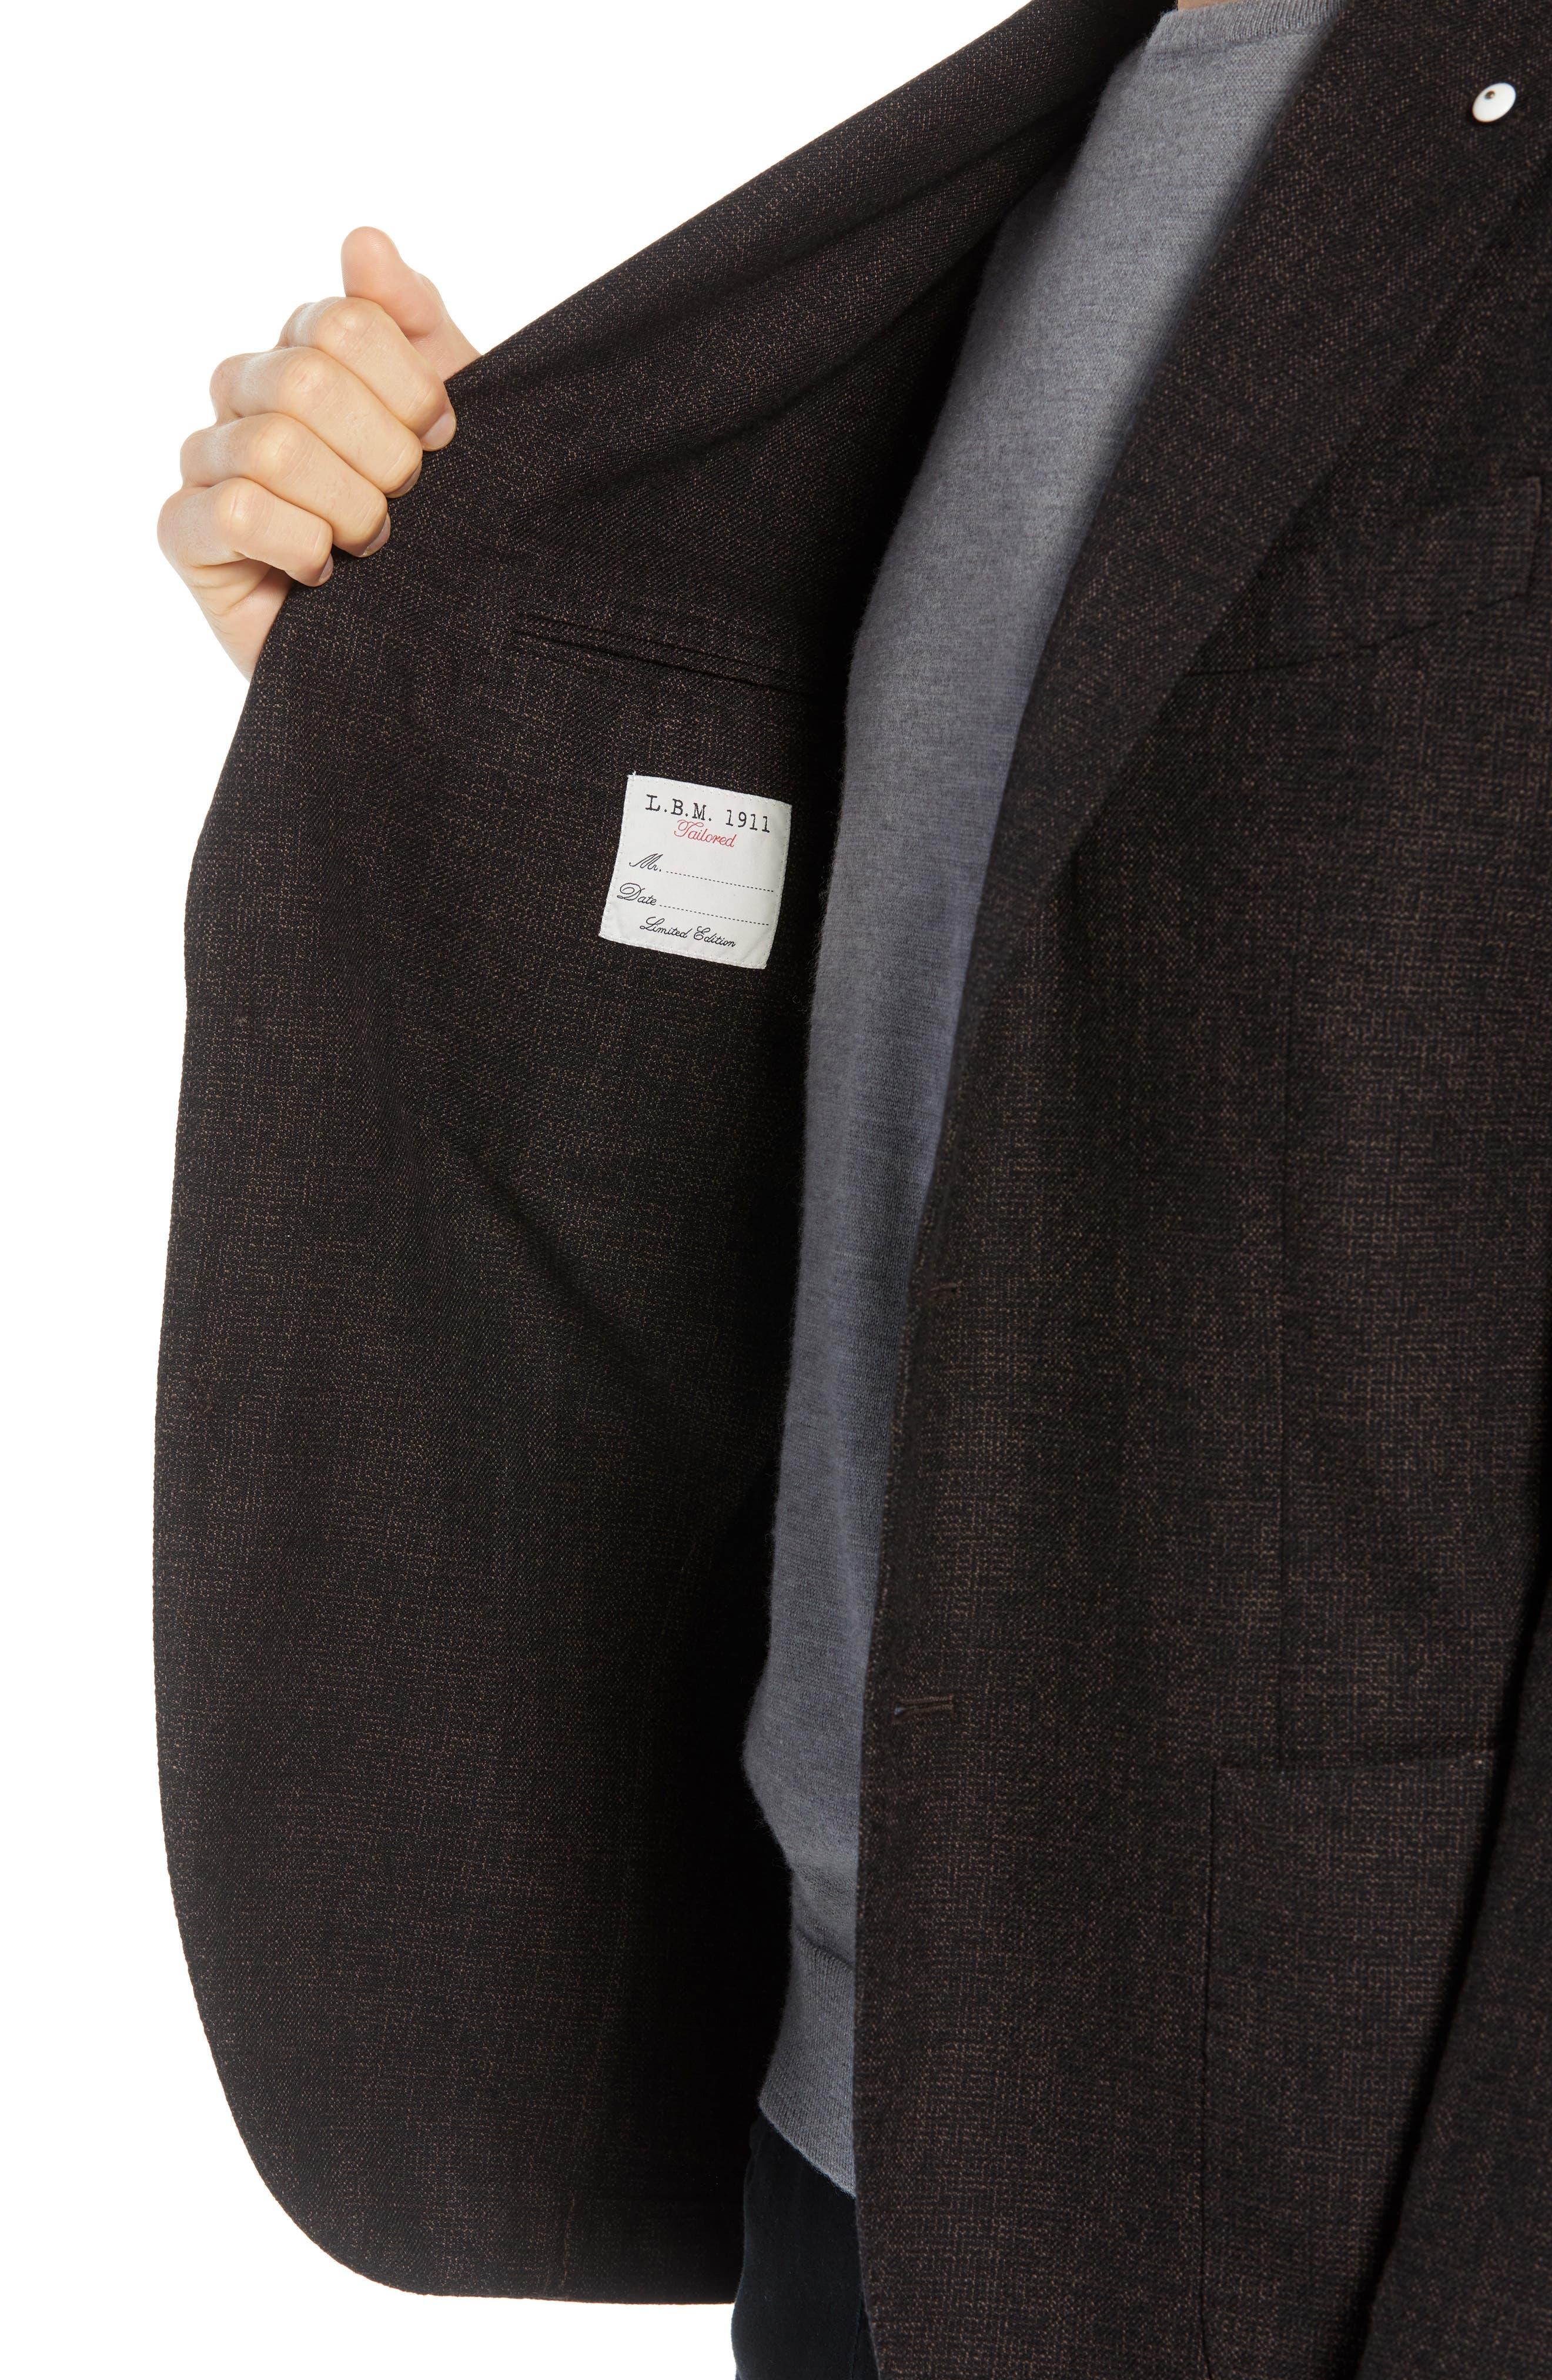 L.B.M 1911 Classic Fit Cotton & Wool Blazer,                             Alternate thumbnail 4, color,                             BROWN